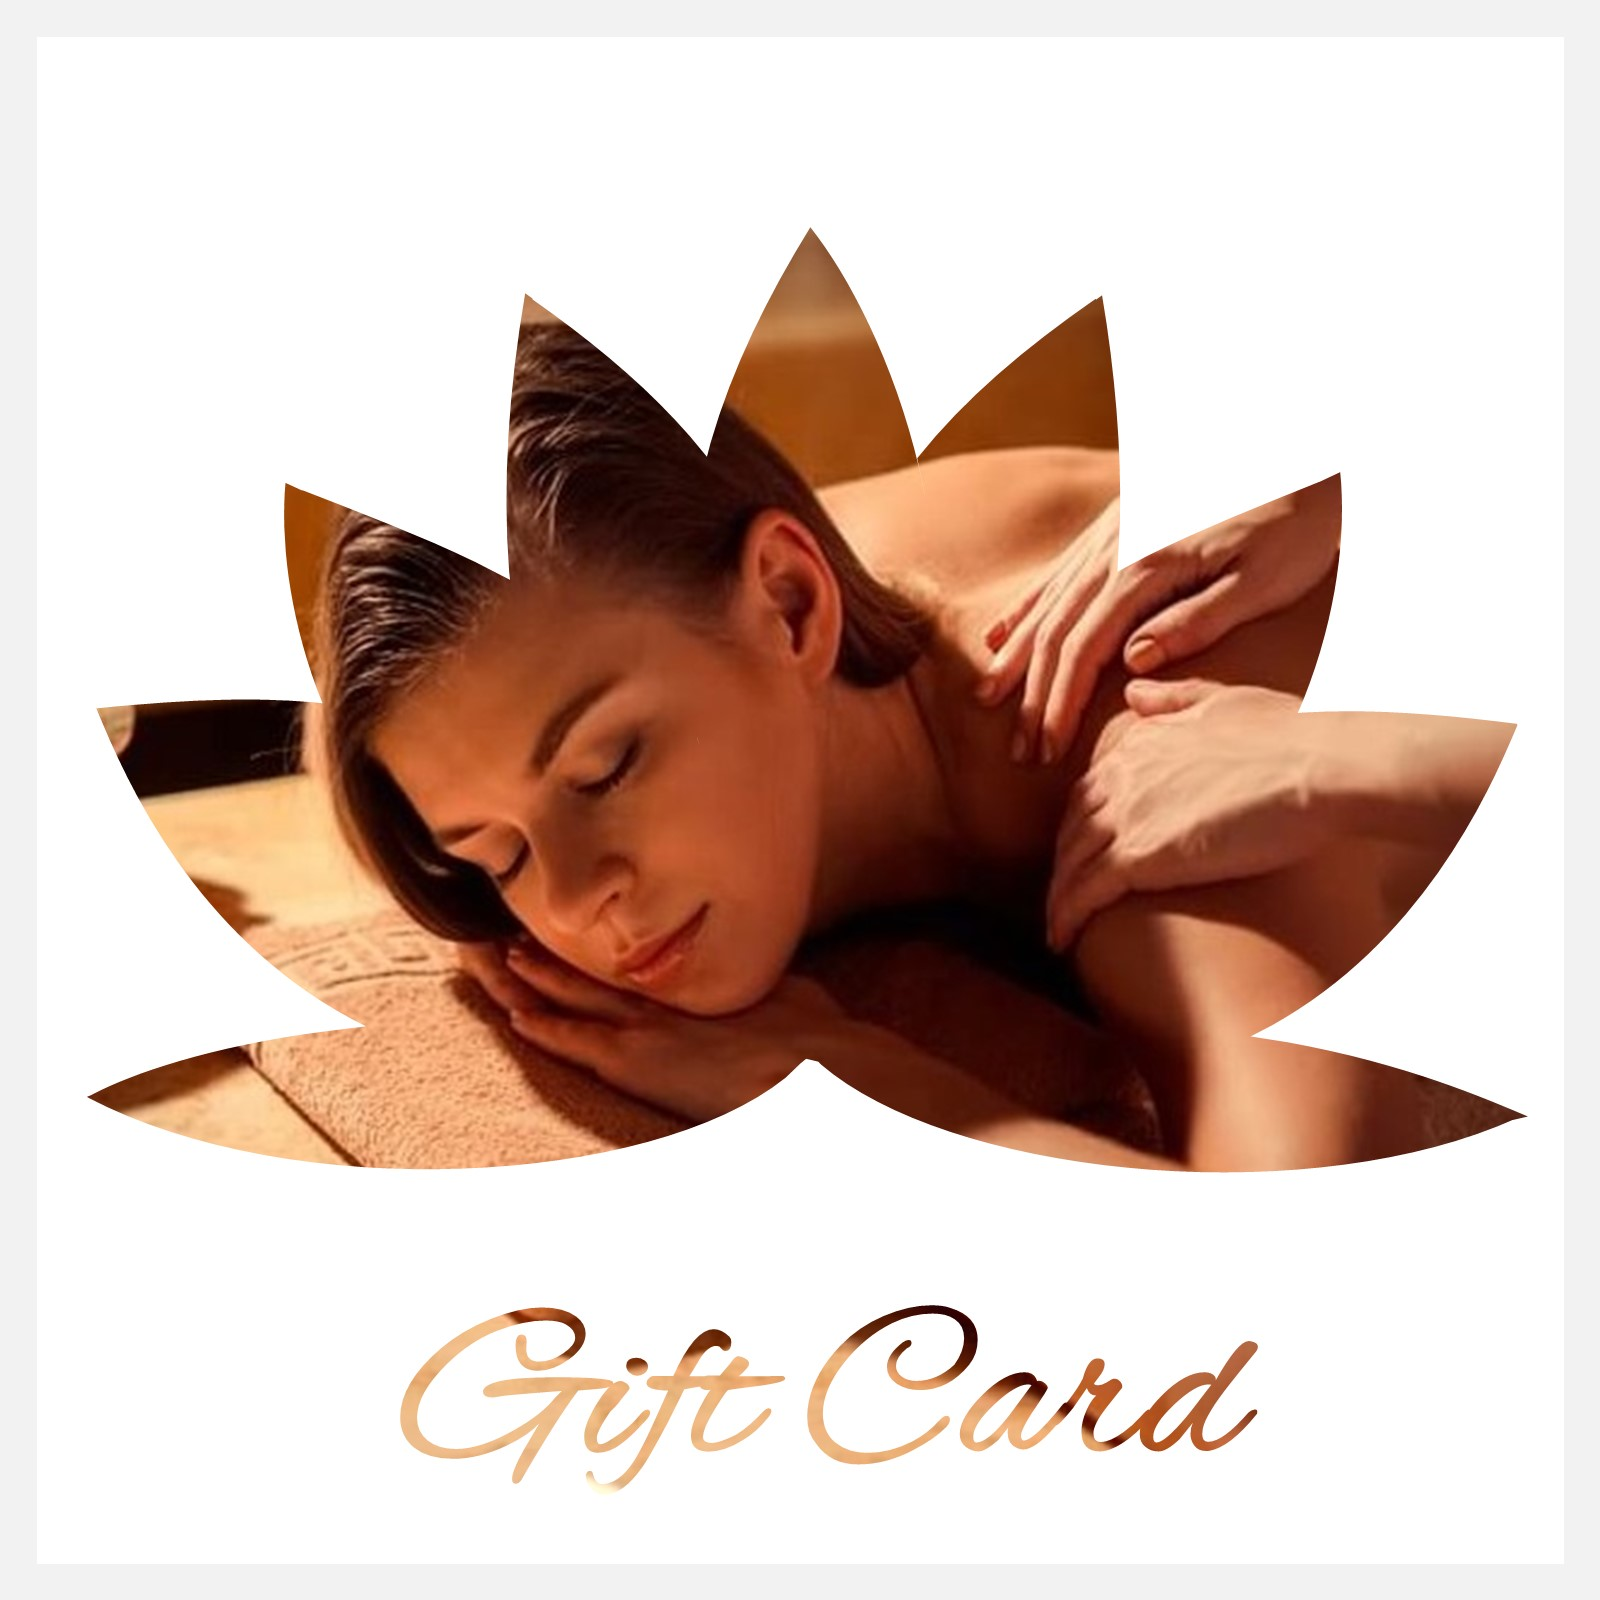 Gift Card Image design